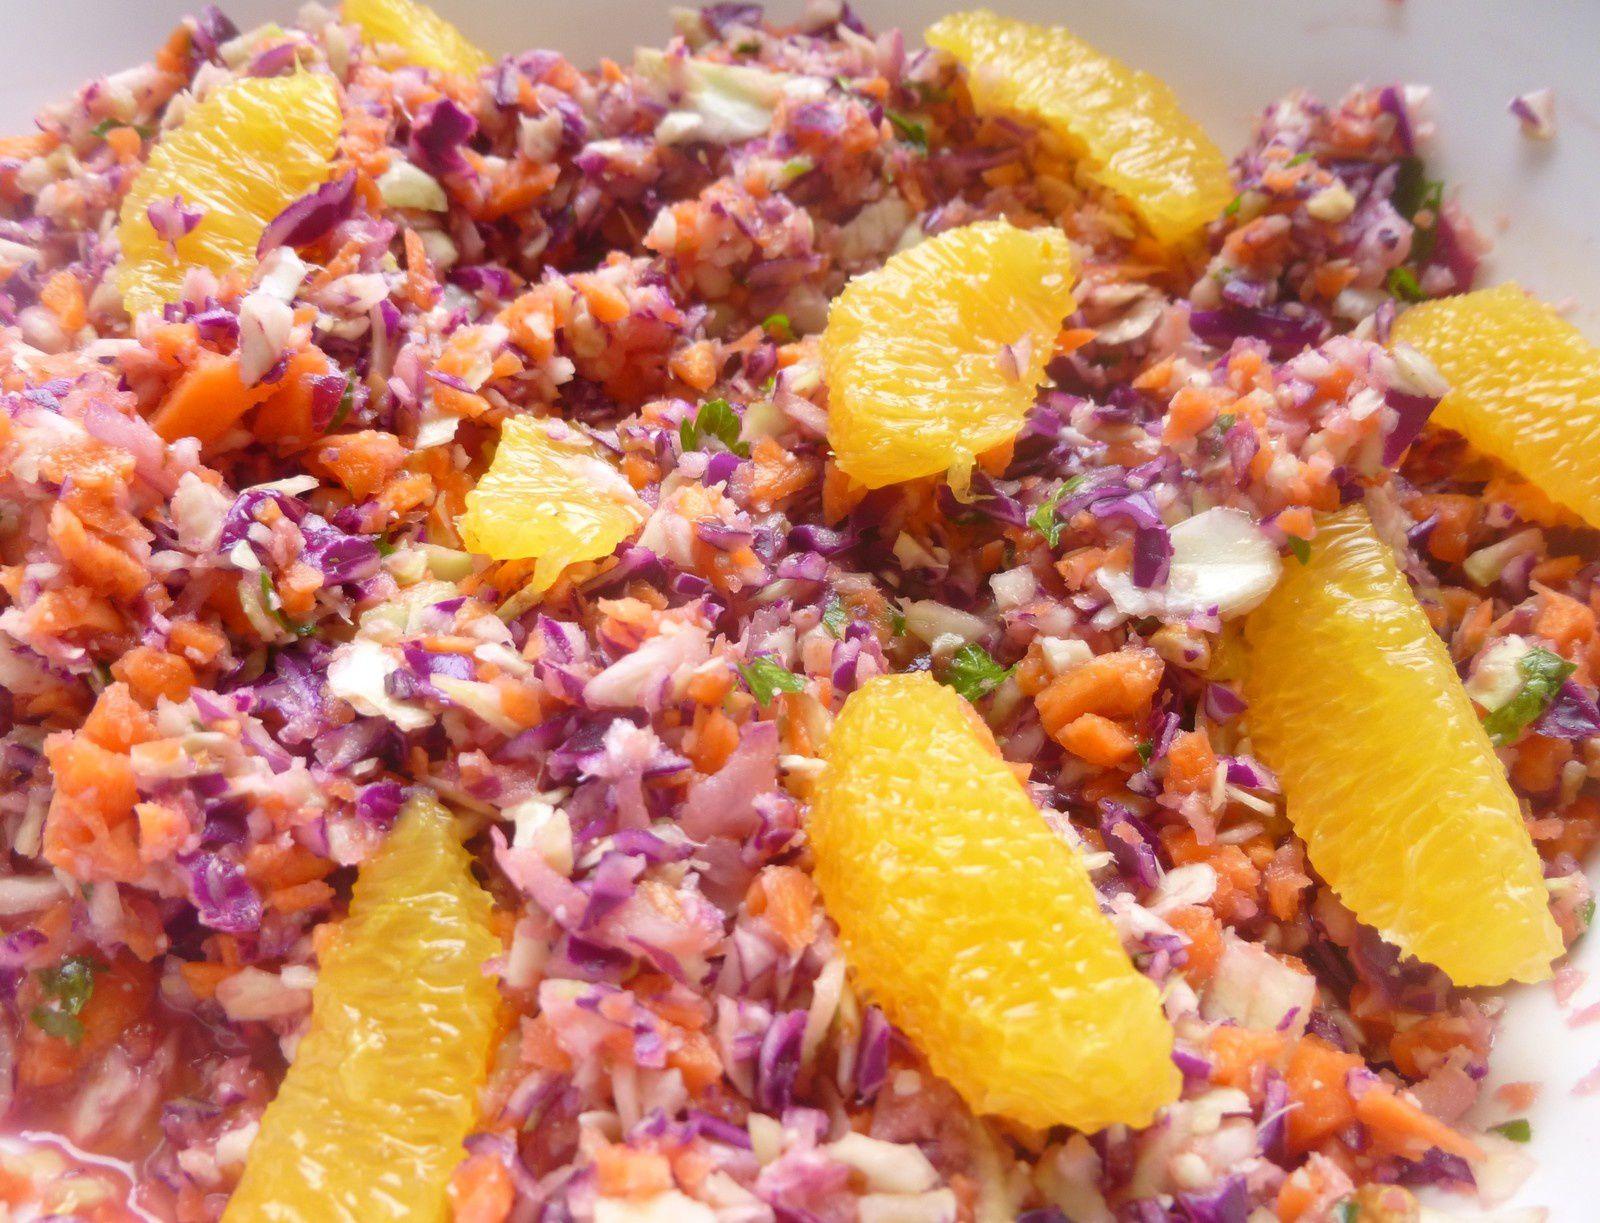 petite salade vite faite ultra-vitaminée